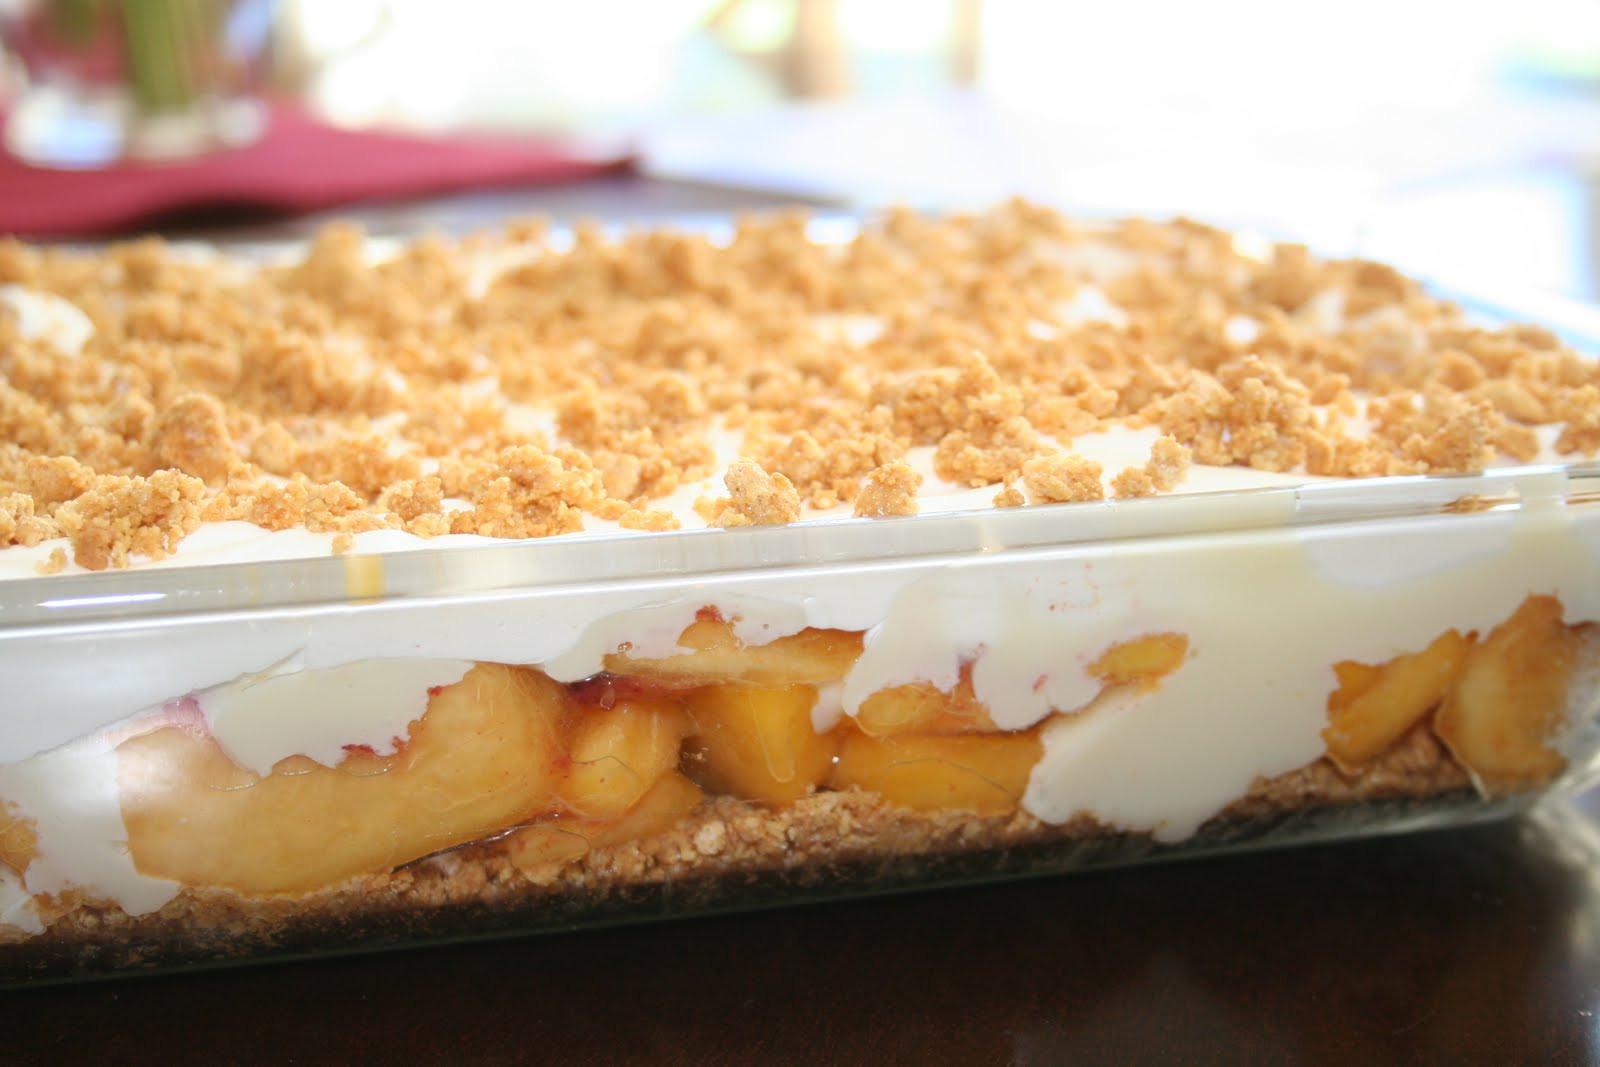 Fresh Peach Dessert Recipe  MY FAVORITE THINGS TO EAT FRESH PEACH DESSERT